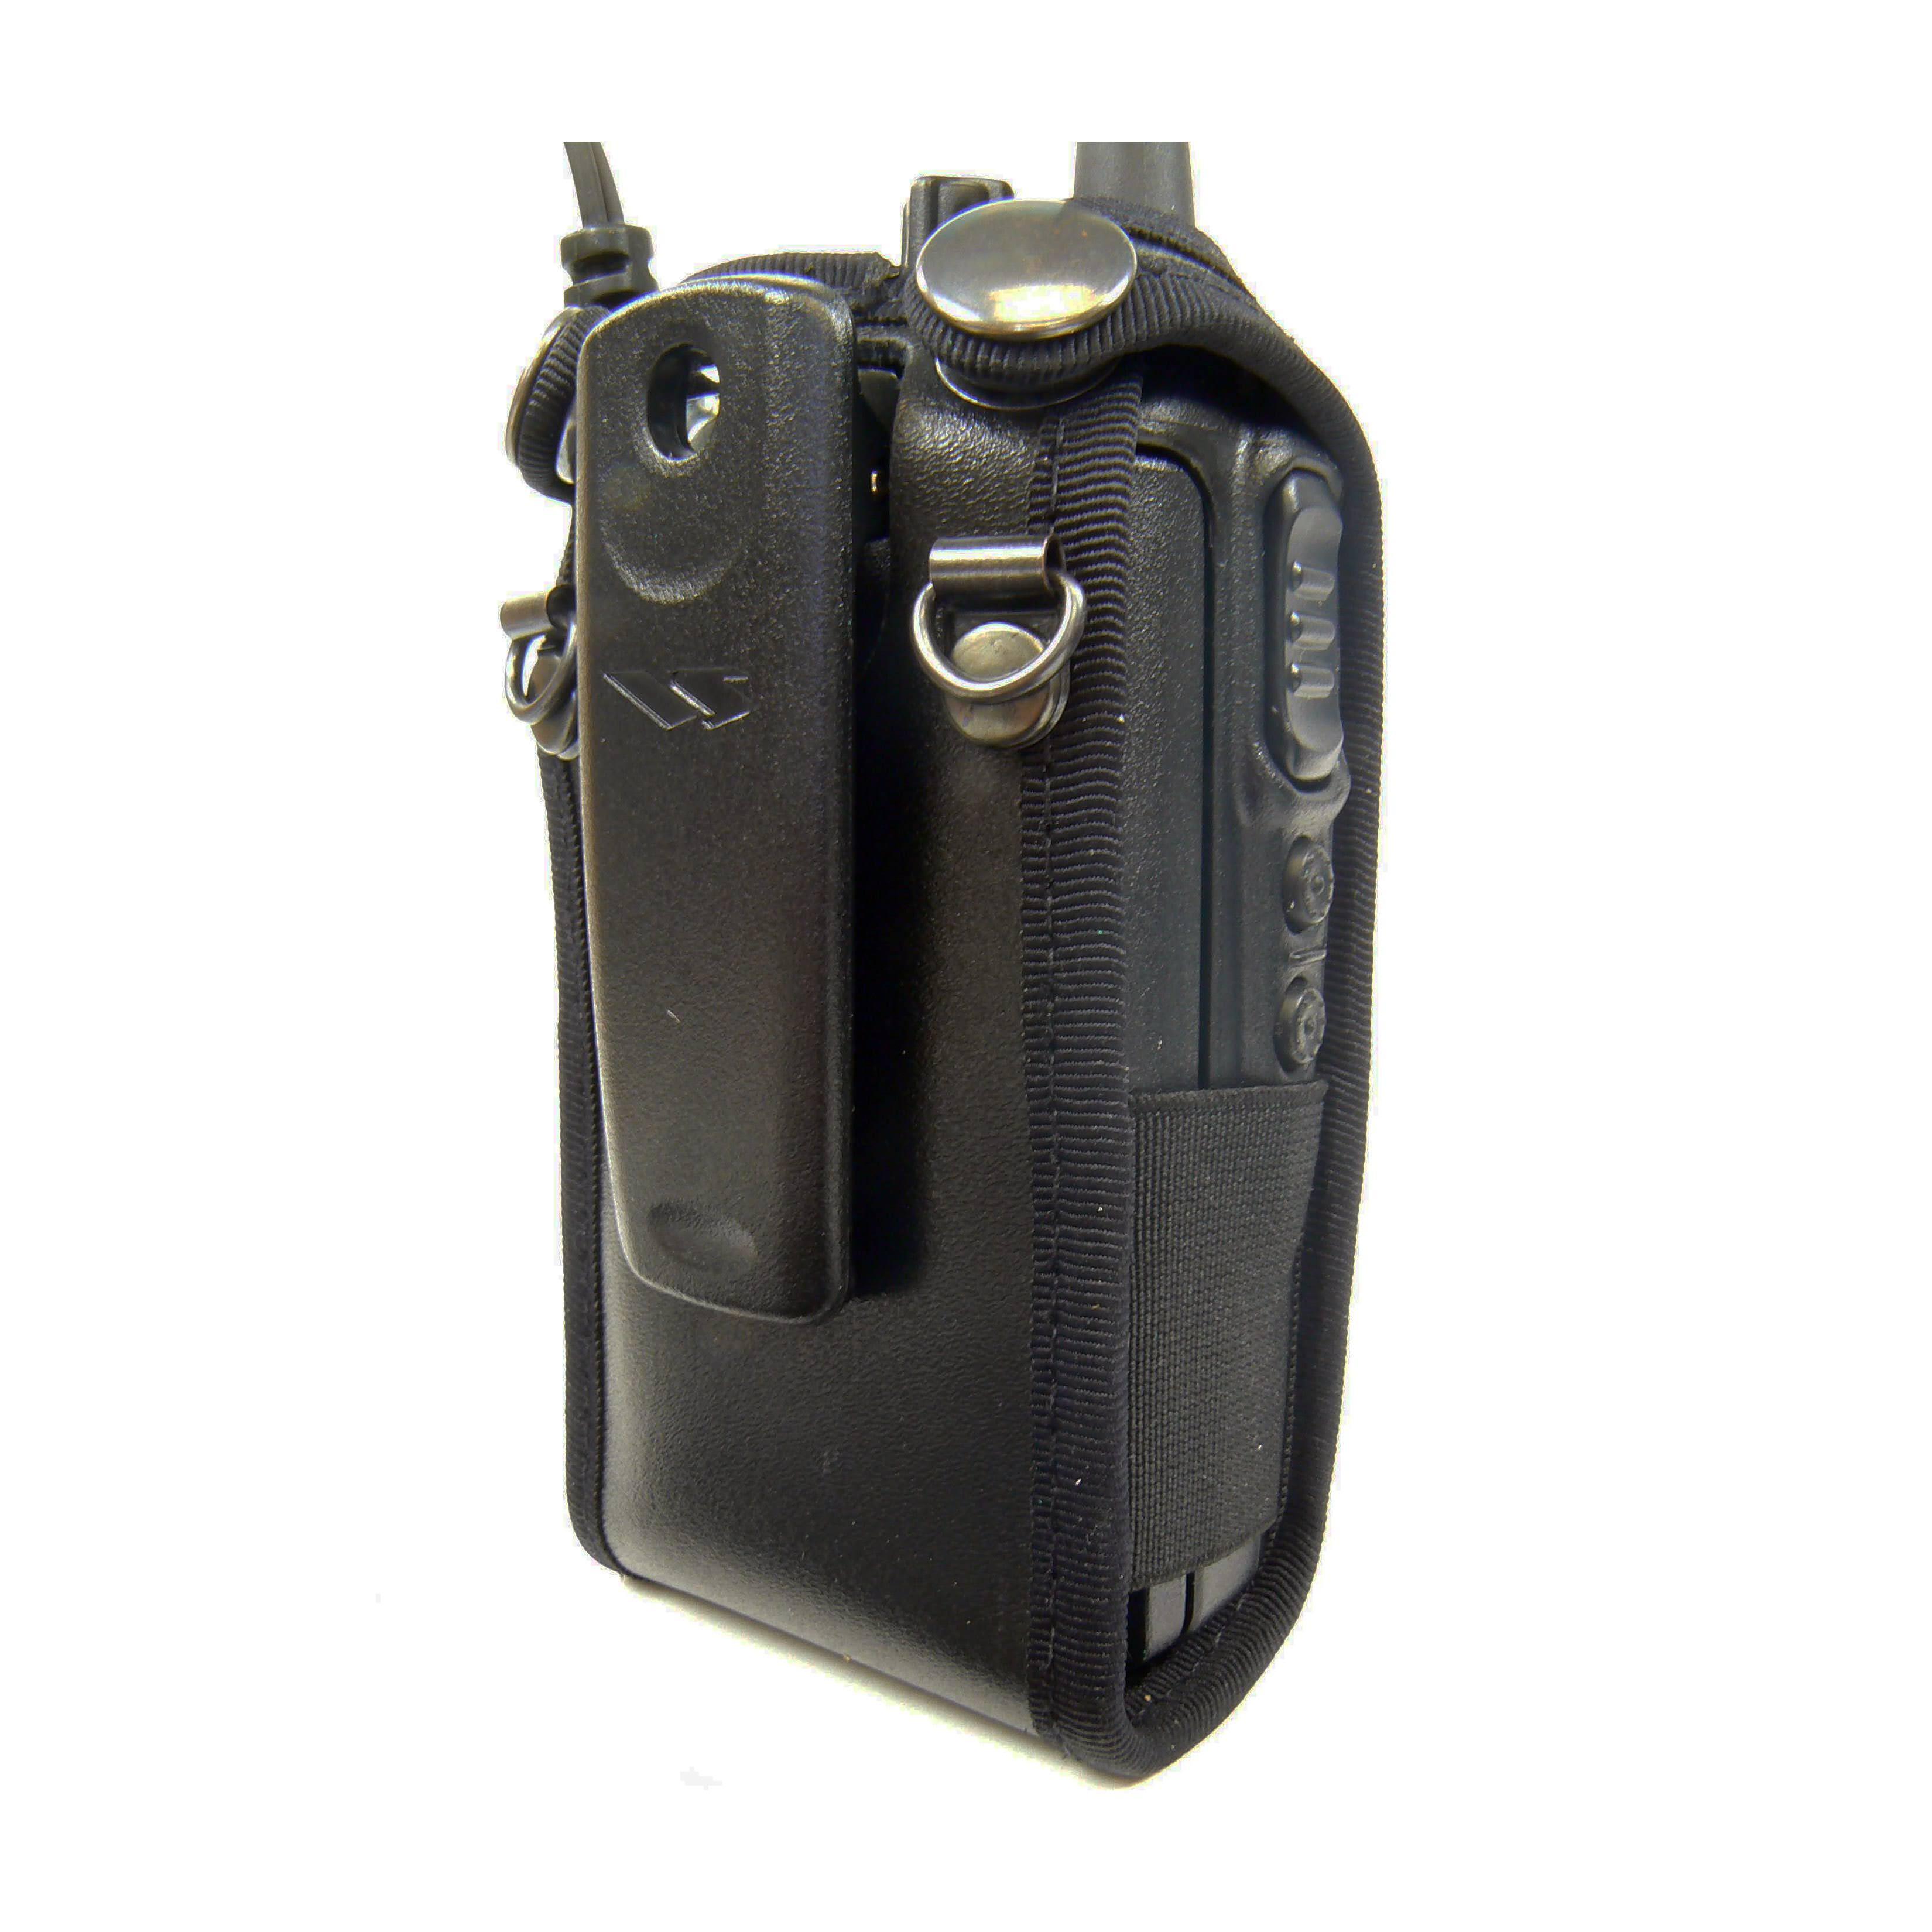 Vertex Yaesu VX350 Radio Case leather